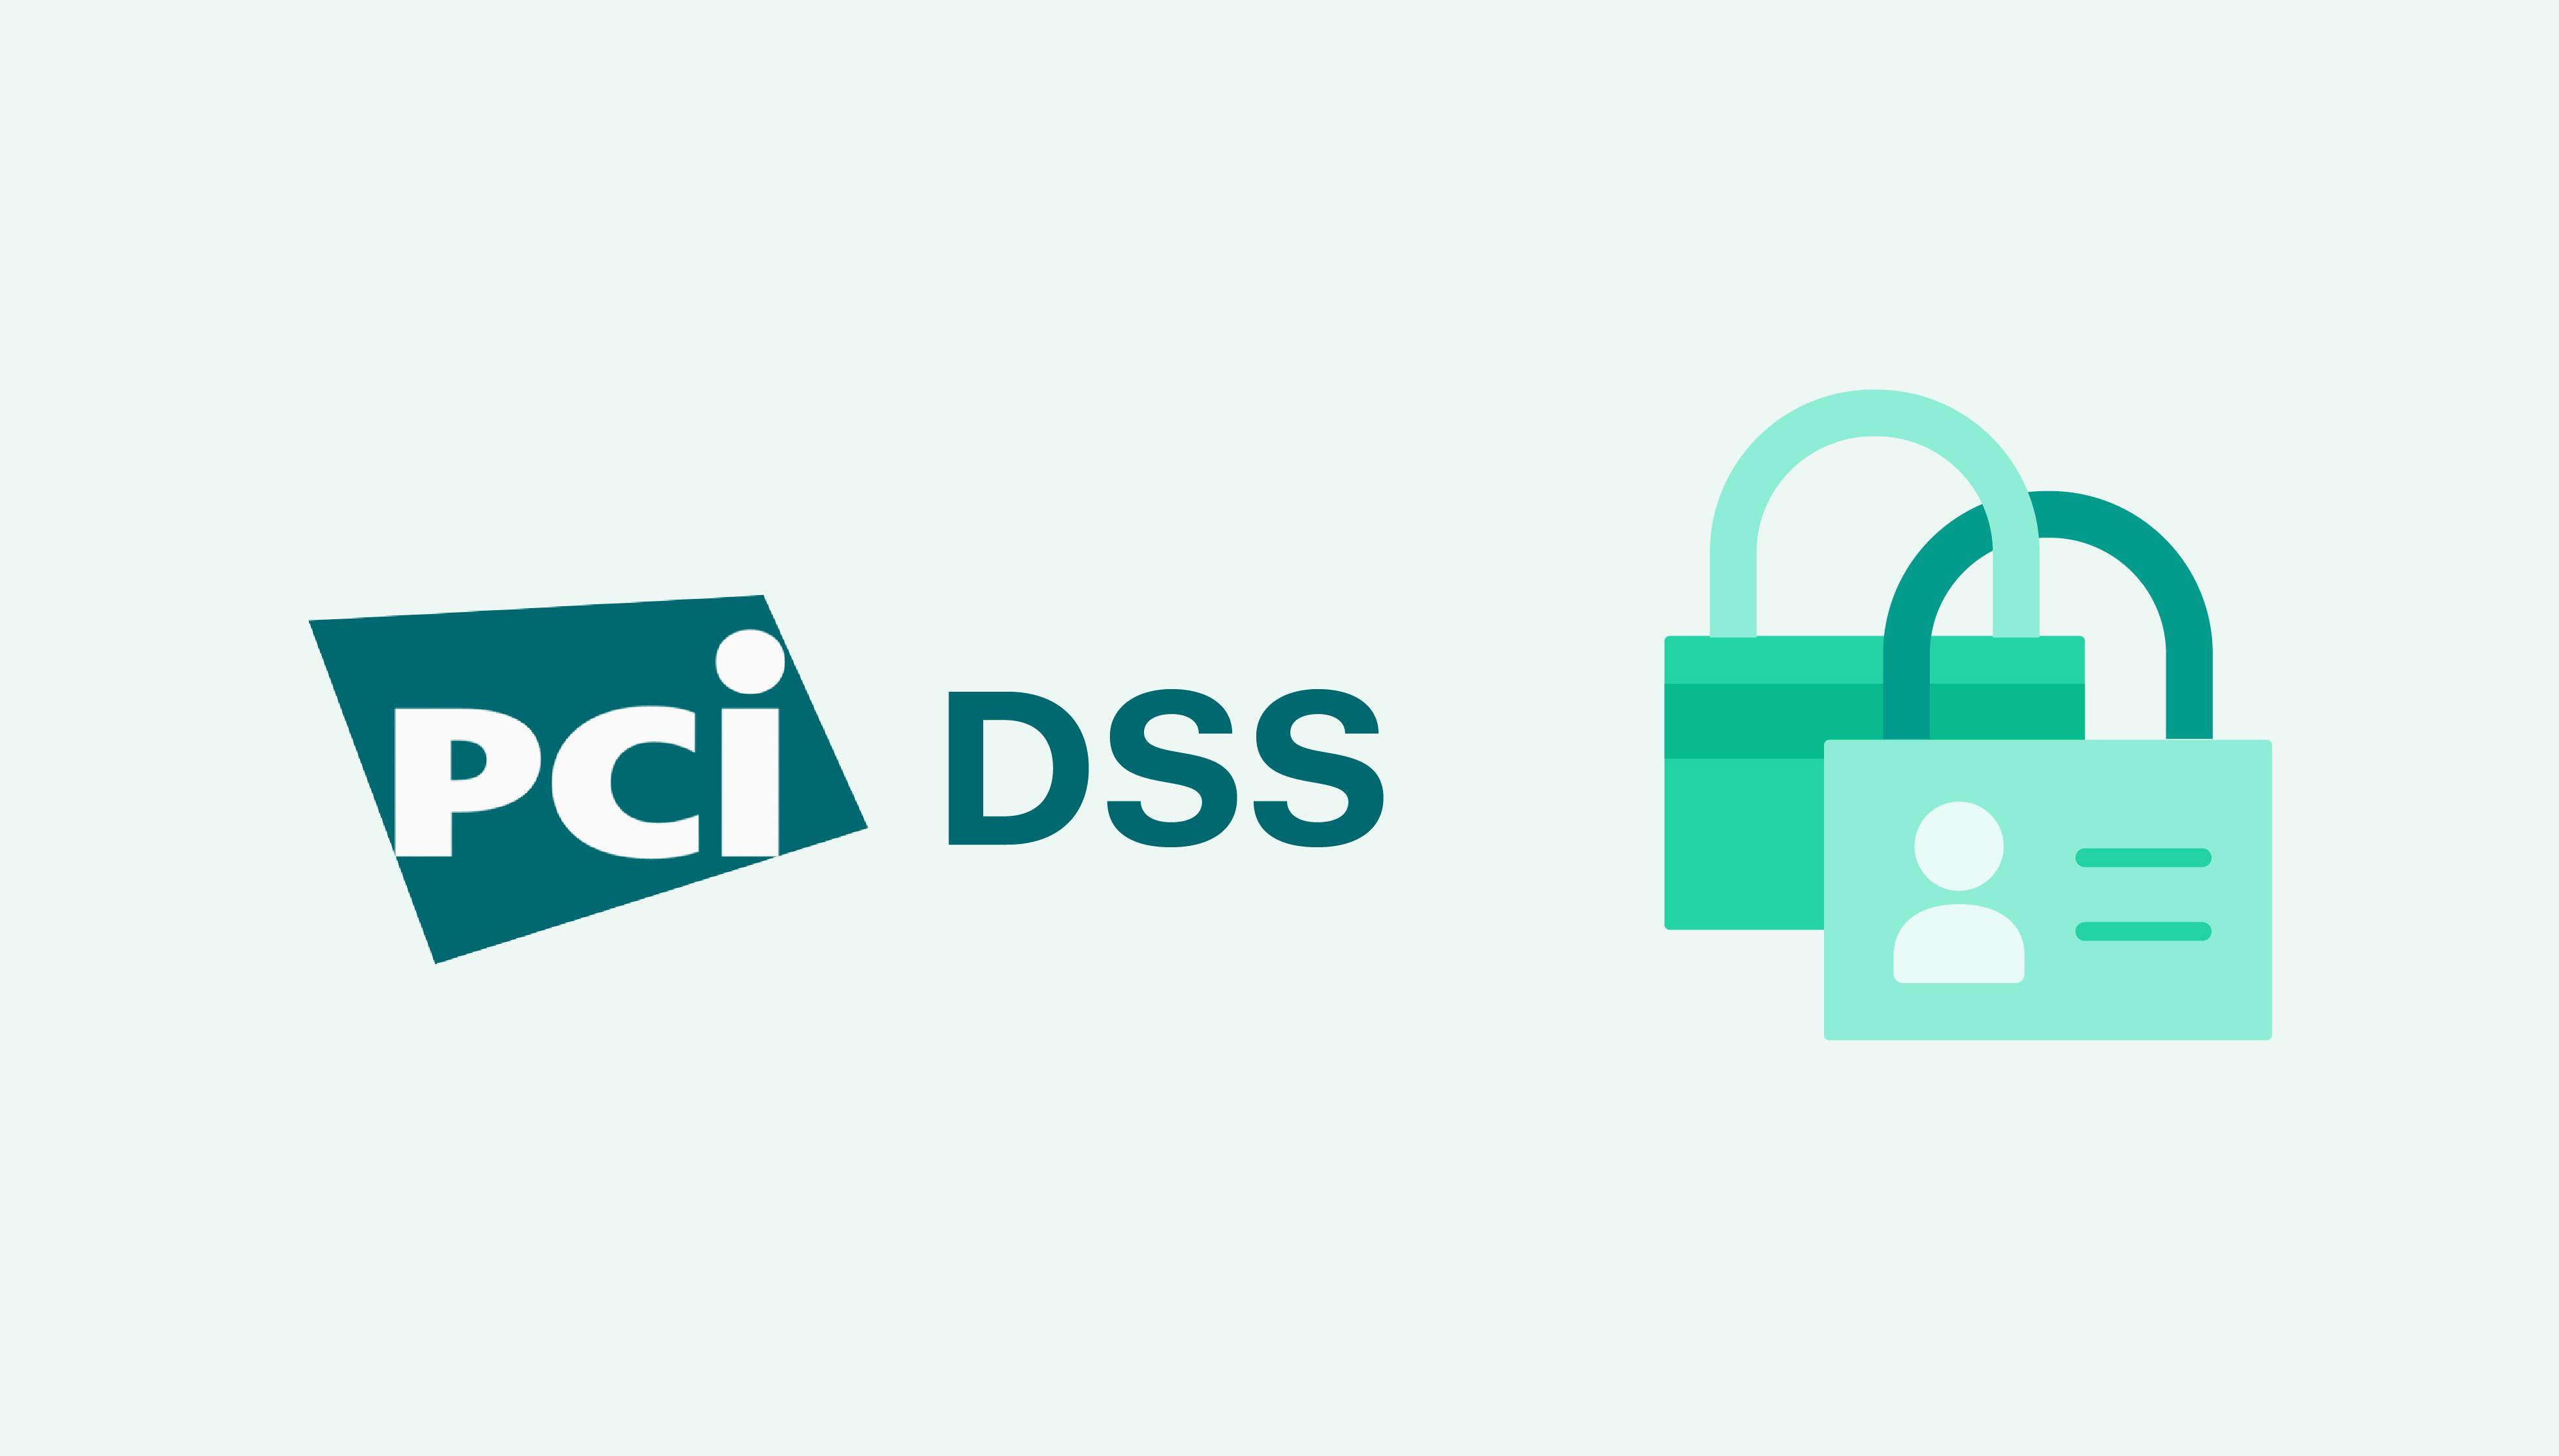 Ping++获 PCI DSS认证 领跑聚合支付数据安全